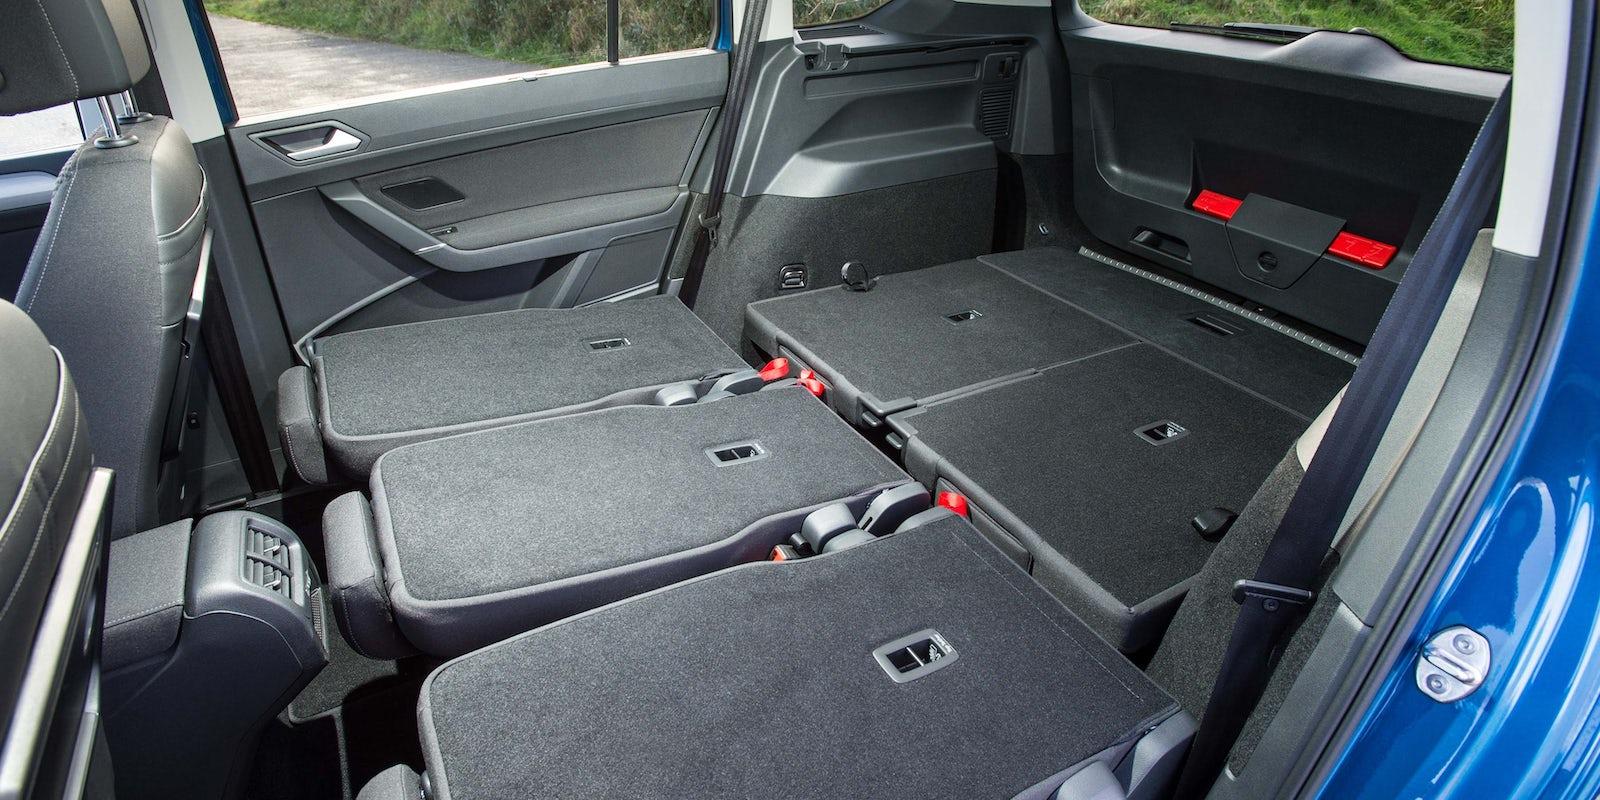 Volkswagen Touran Interior And Infotainment Carwow